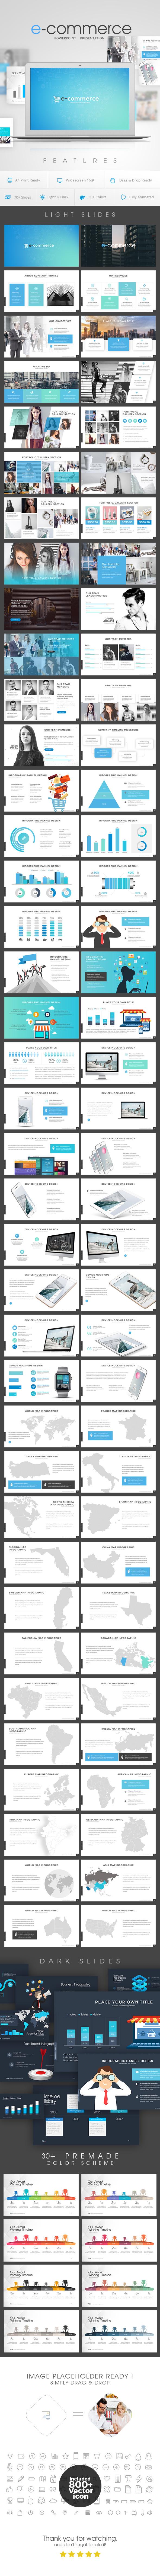 E-commerce Power Point Presentation) - Business PowerPoint Templates